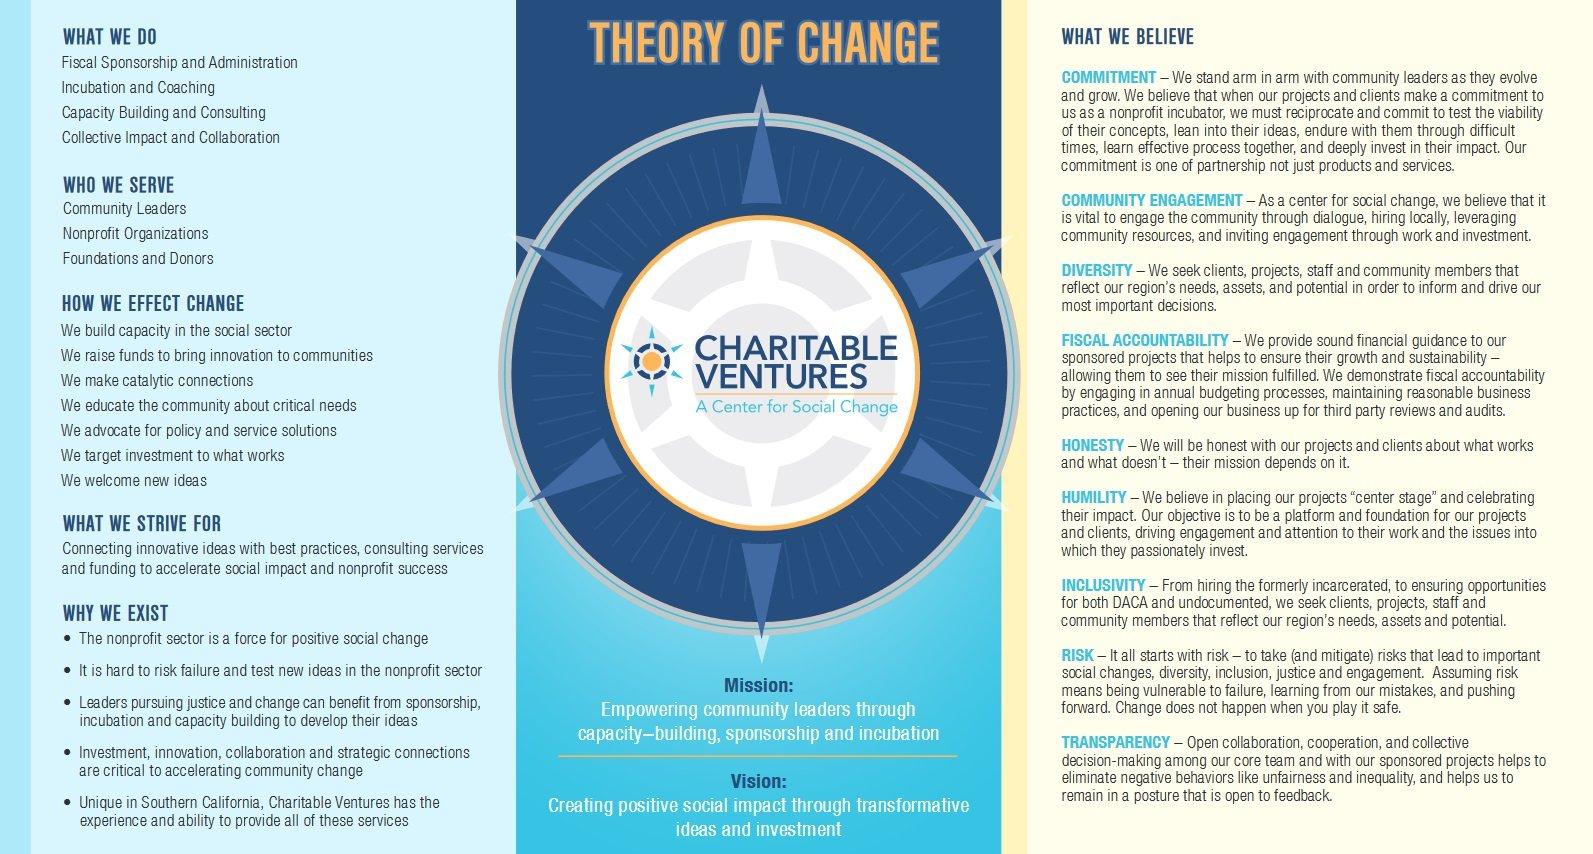 sponsorship-incubation-charitable-ventures